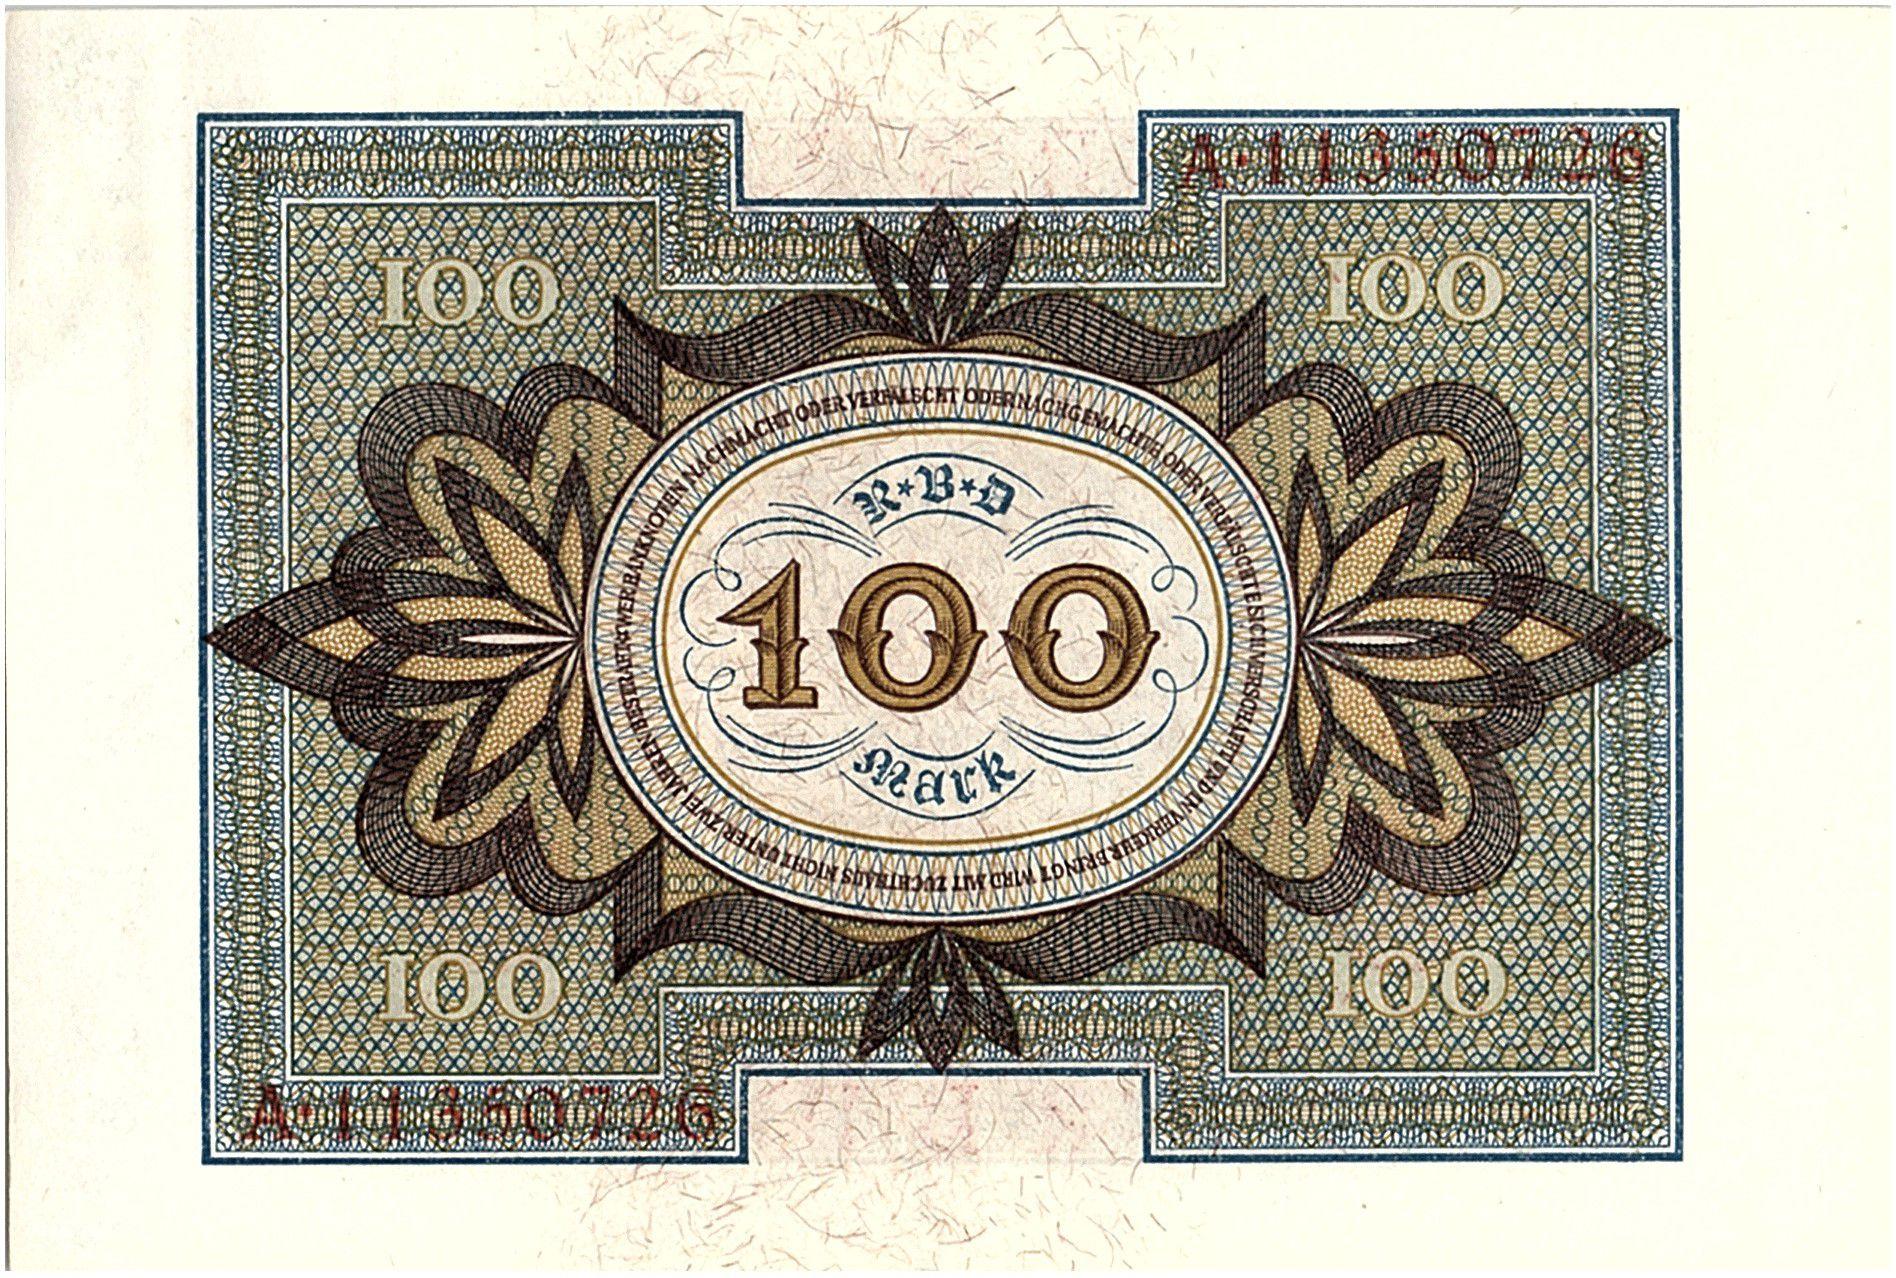 Allemagne 100 Mark Cavalier de Bamberg - 1920 - P.69 Série A - SPL